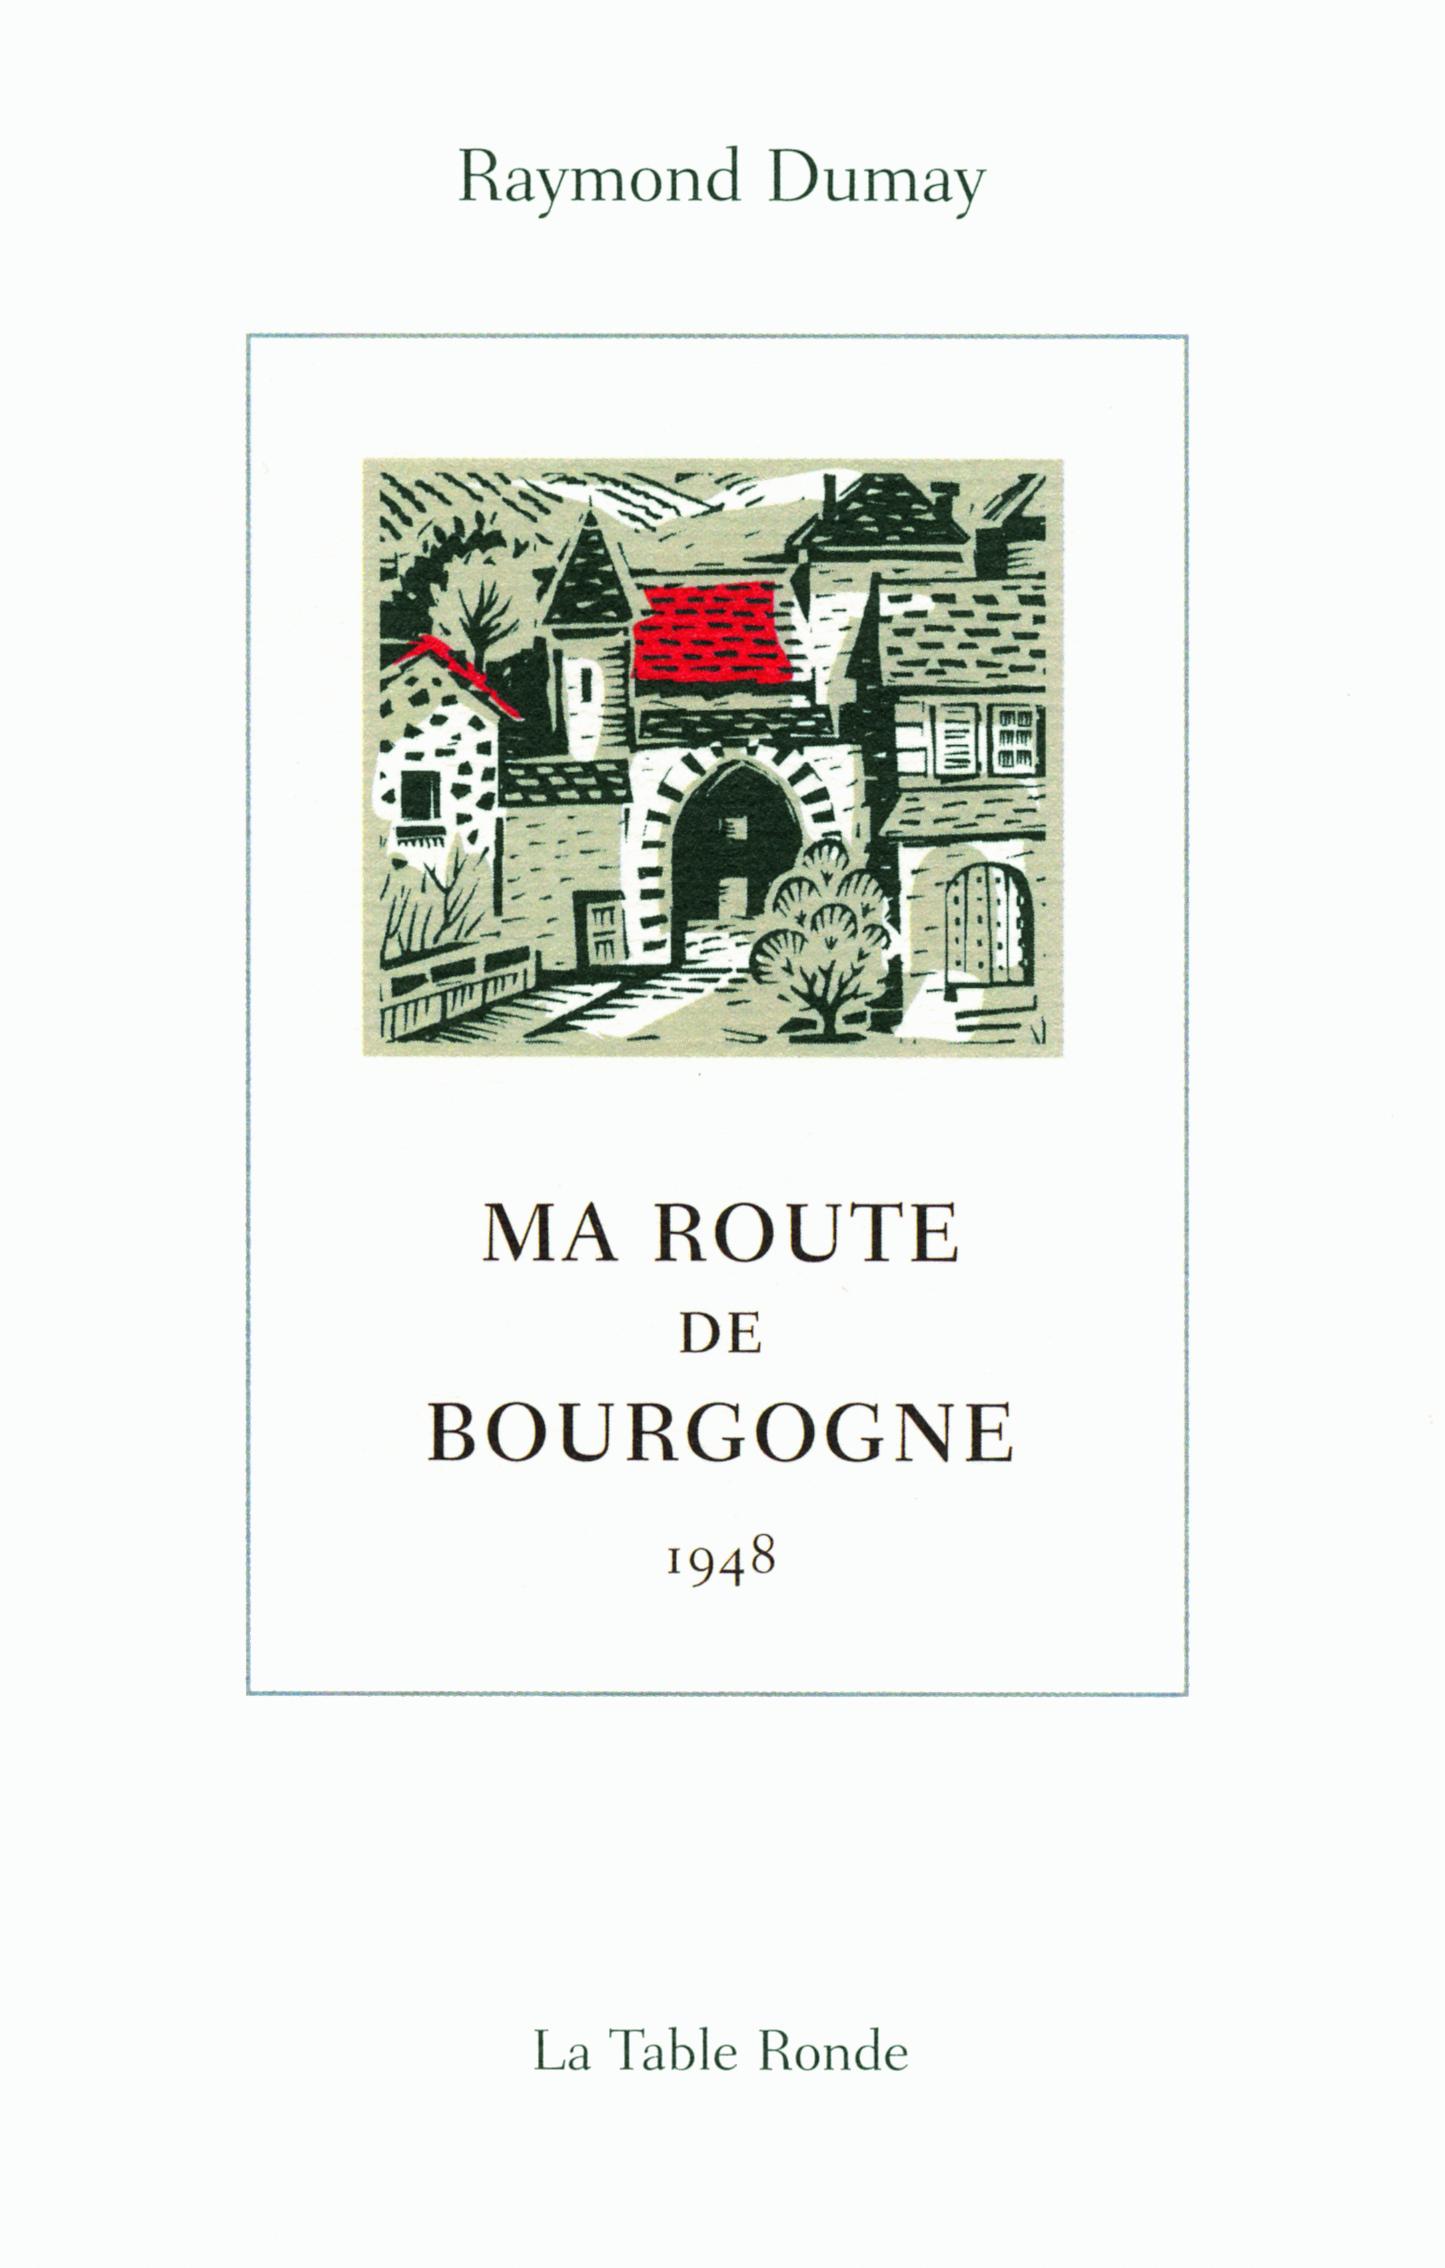 MA ROUTE DE BOURGOGNE - (1948)